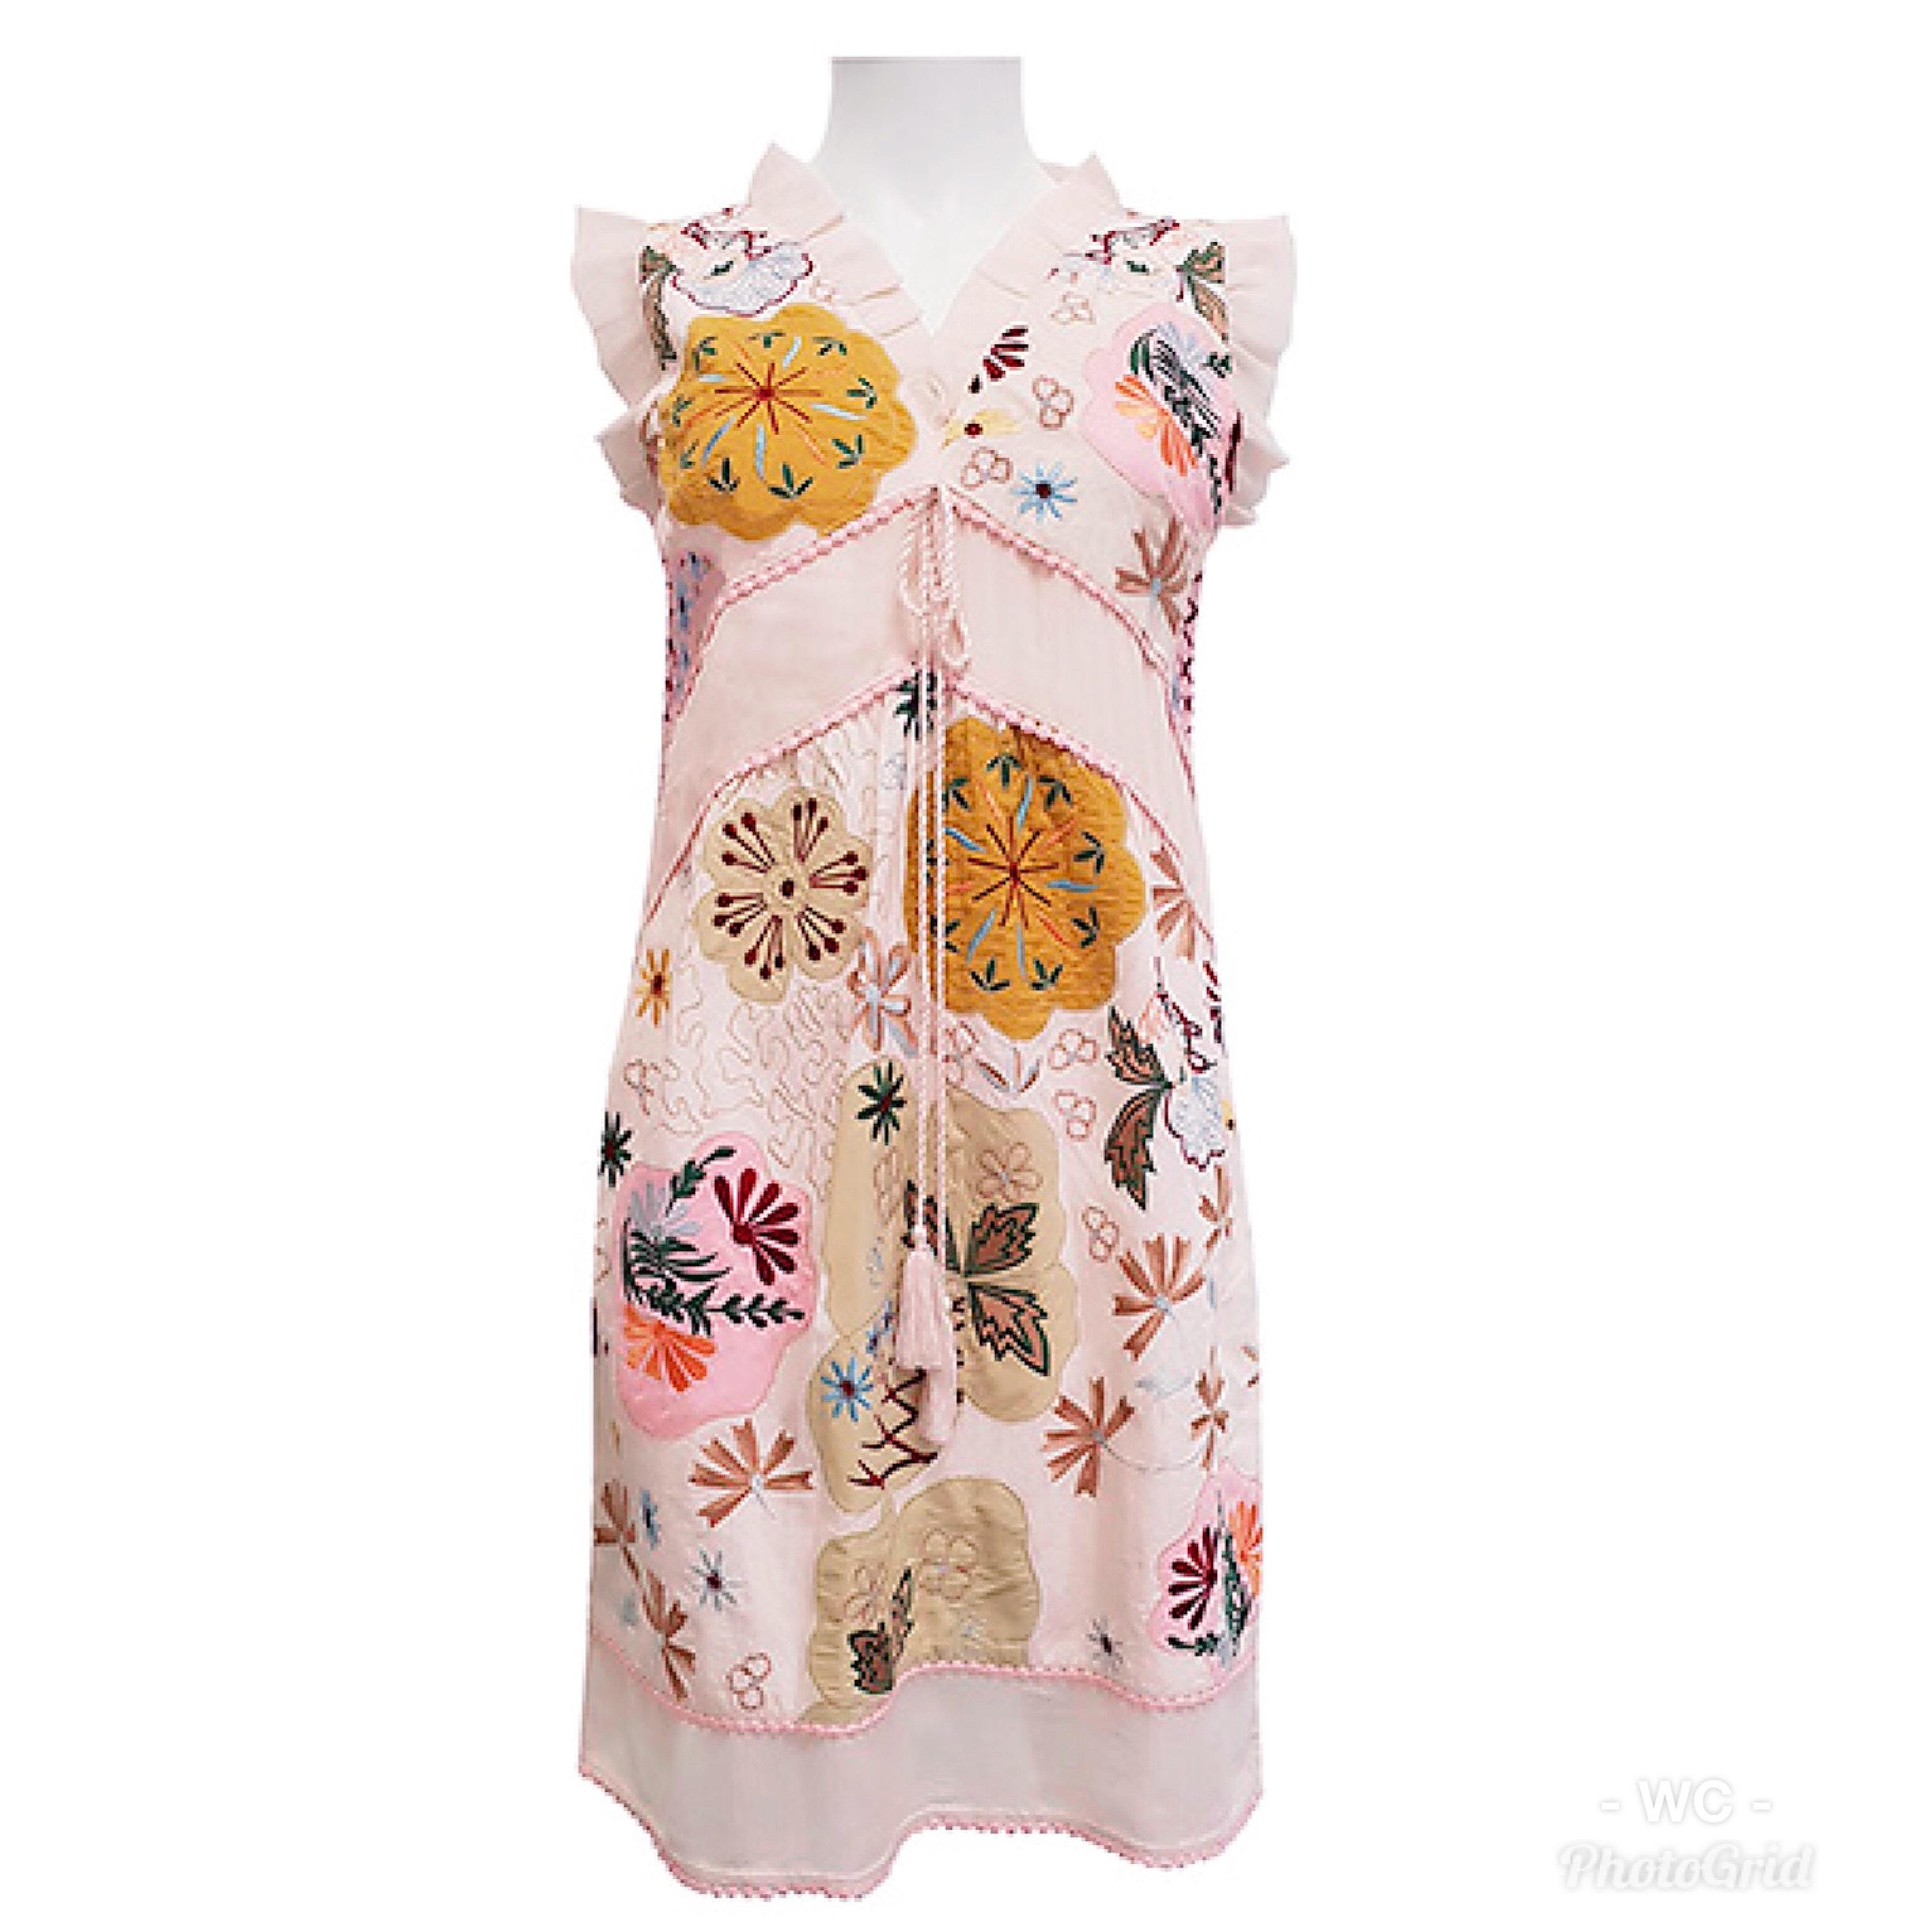 Shoklett: Pale Pink Rose Bouquet Jody Dress/Tunic